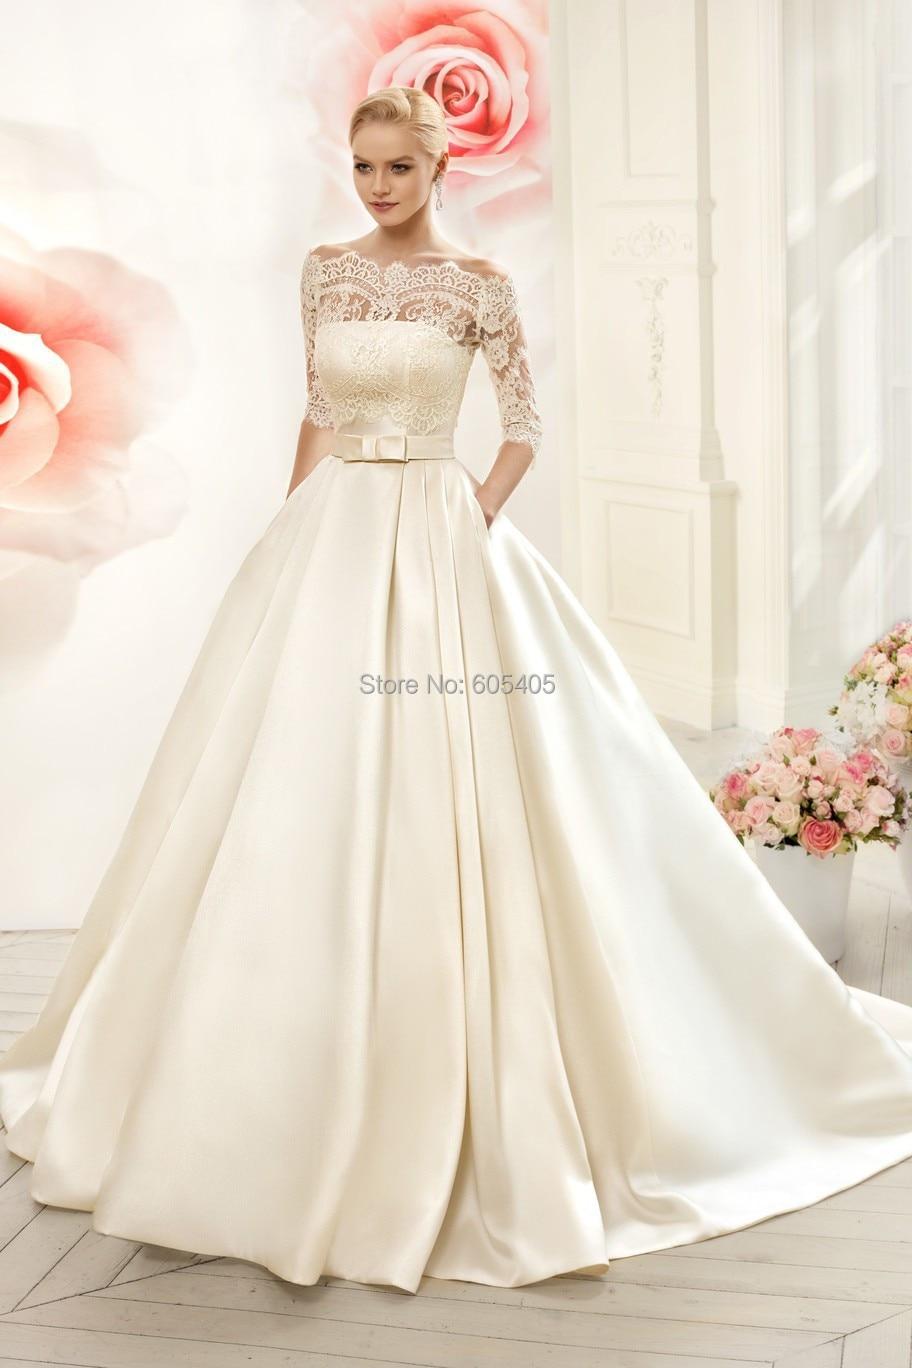 wedding reception dress reception dresses for wedding Short full skirt SherriHill dress with beaded bodice Wedding reception dress Second